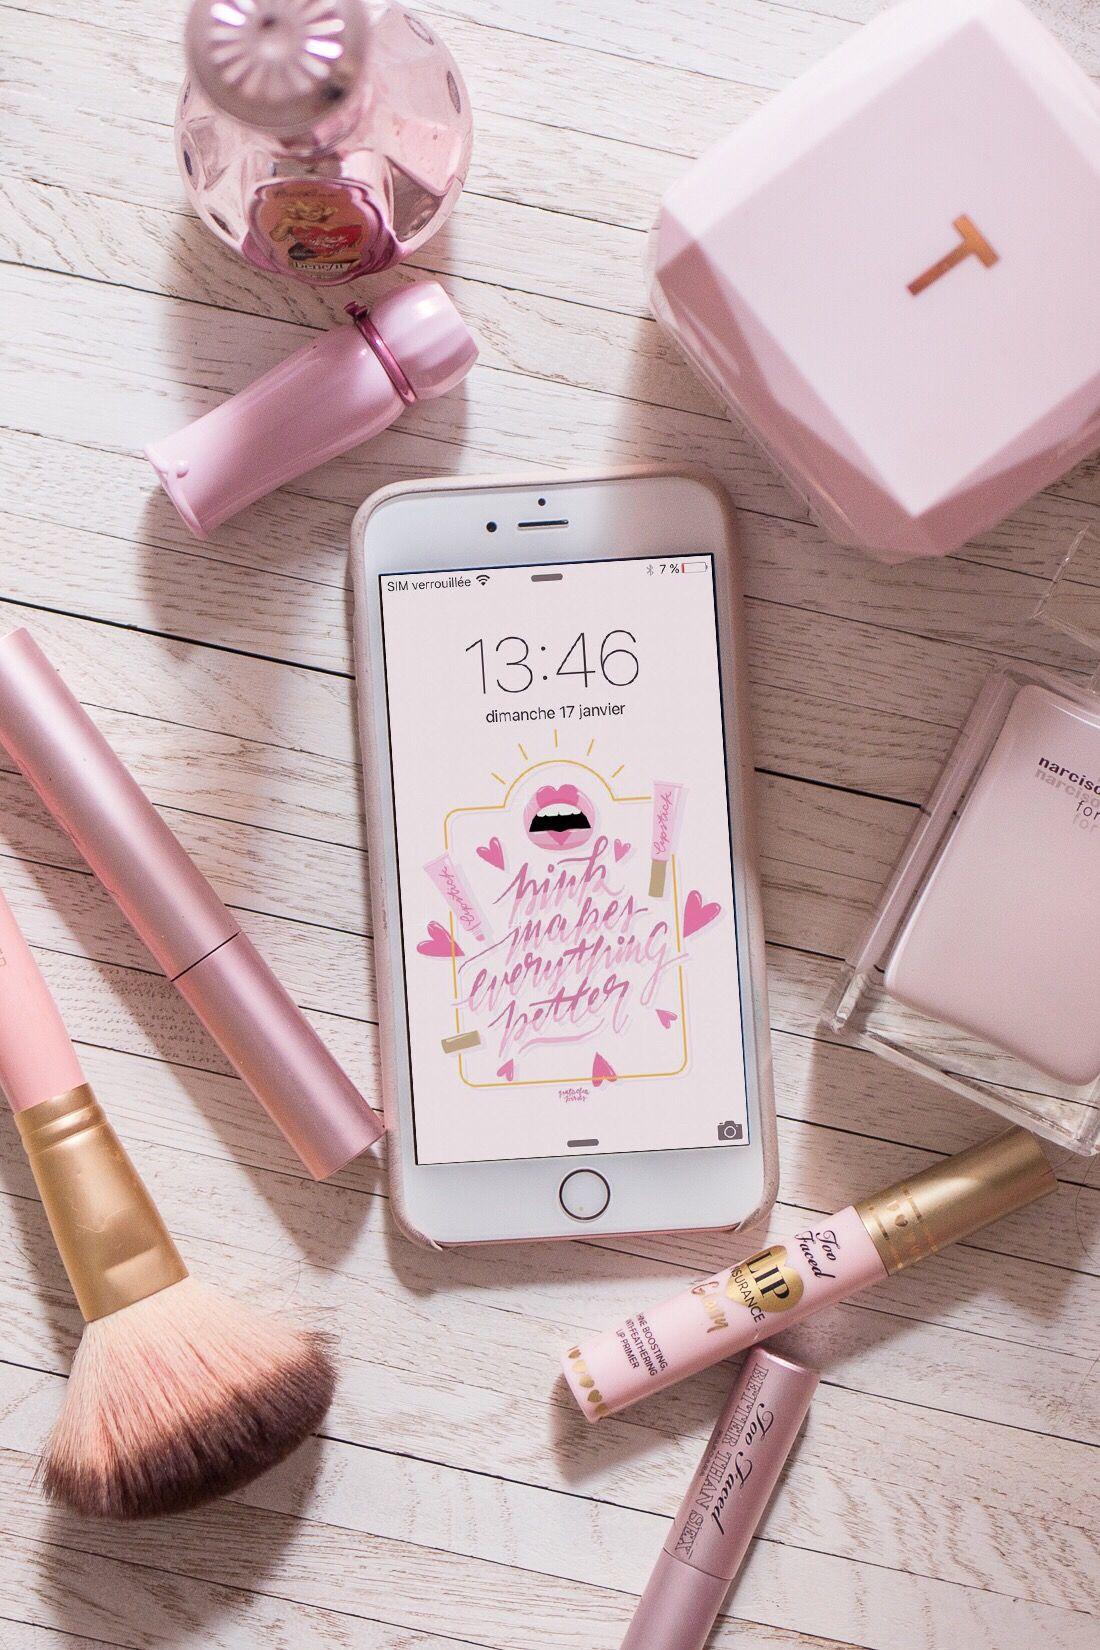 Aesthetic Rose Gold Iphone Wallpaper